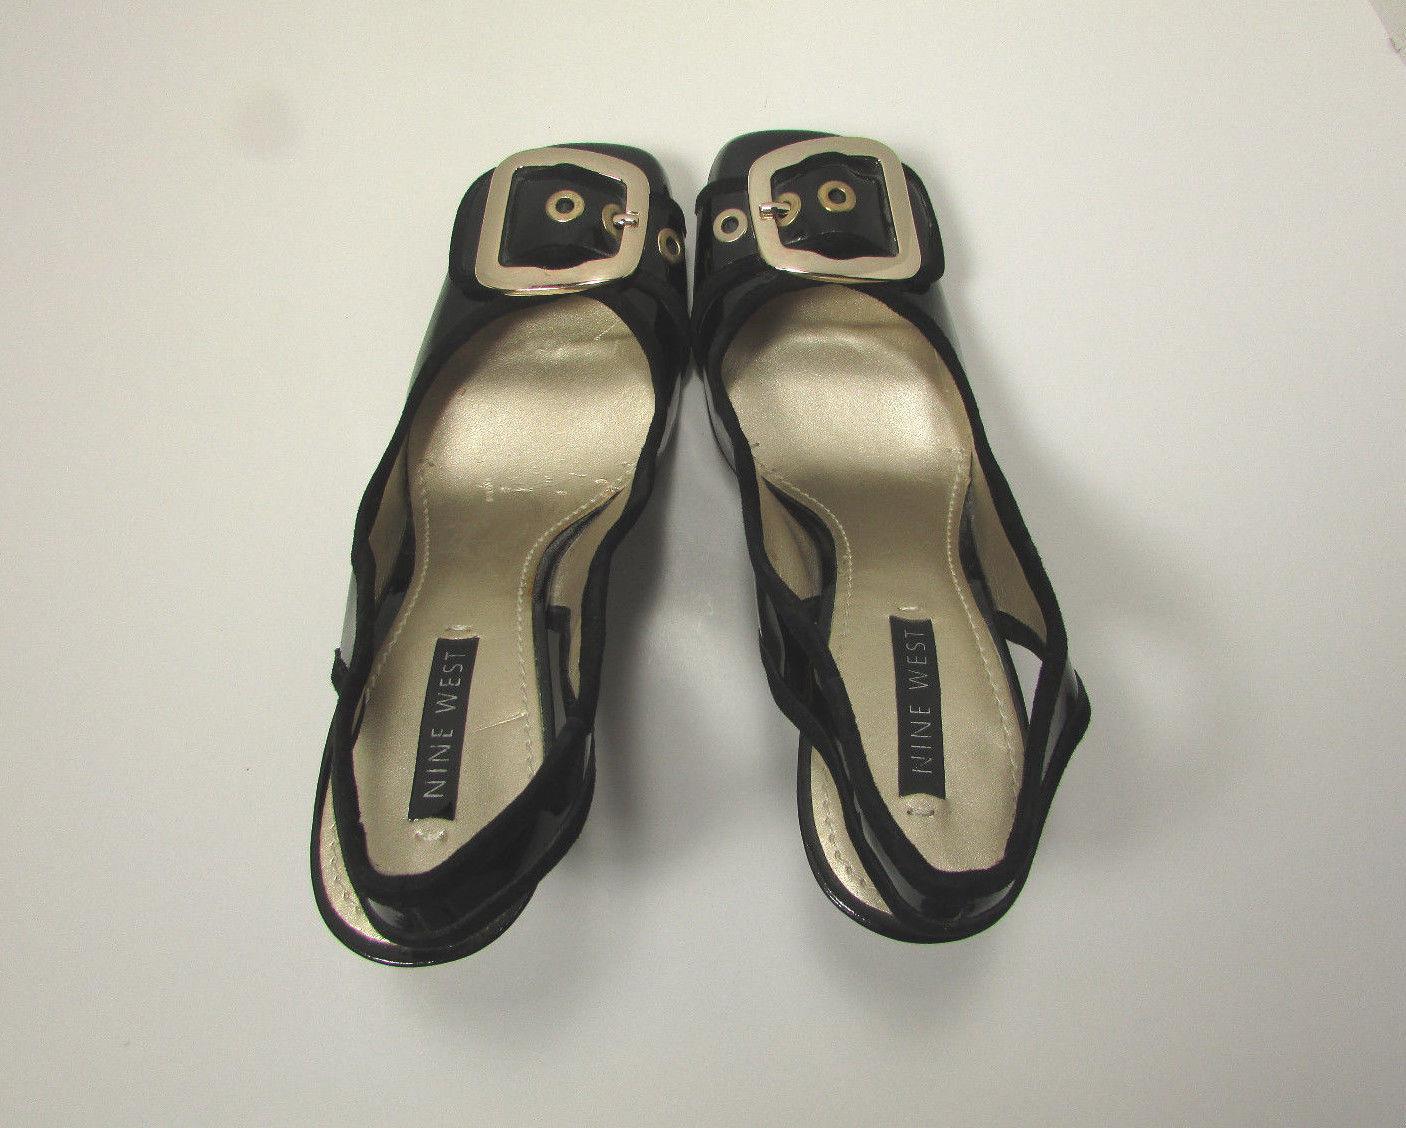 Nine West Black Leather Chunky Heel Slingback W/Buckle High Heel Shoe Size 8 M